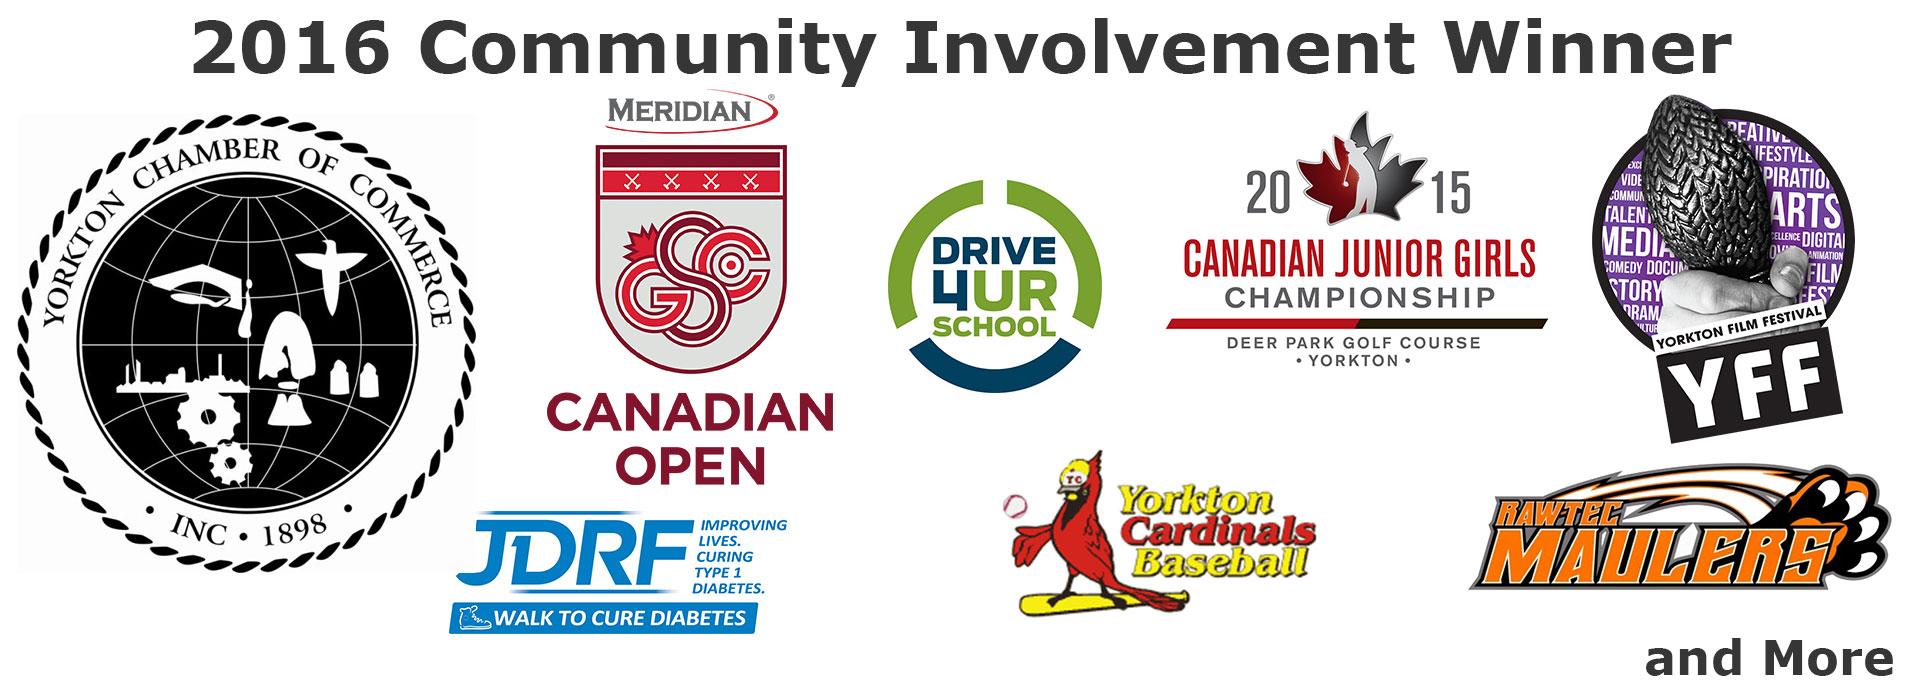 Community Involvement Winner